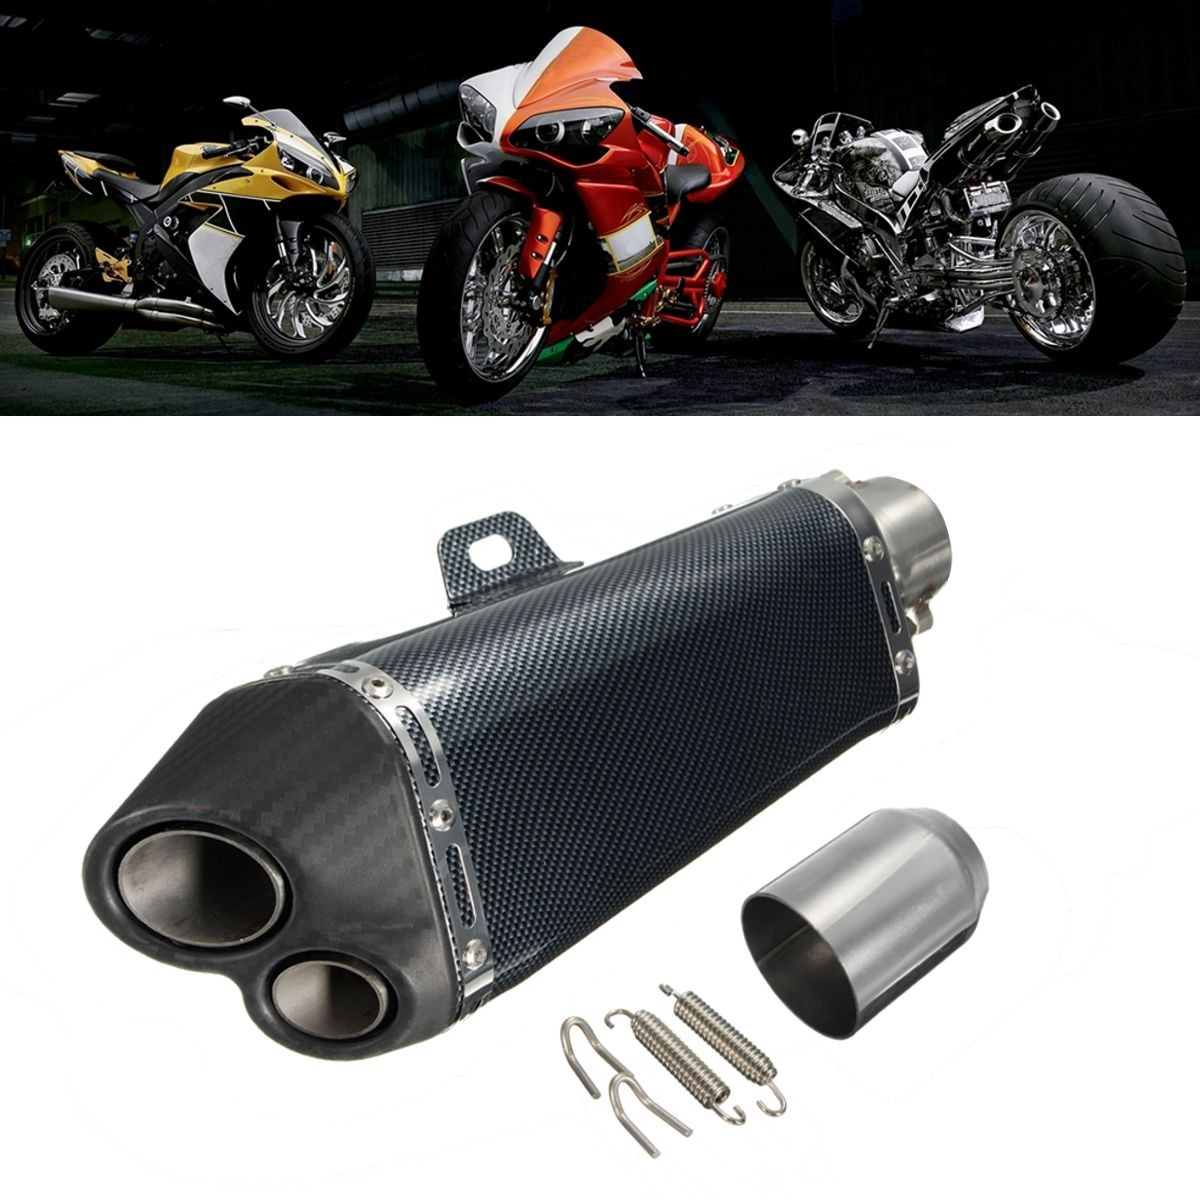 38-51mm Motorcycle Stainelss Steel Exhaust Muffler Pipe Dirt Bike Street Bike Scooter ATV for Honda for Kawasaki